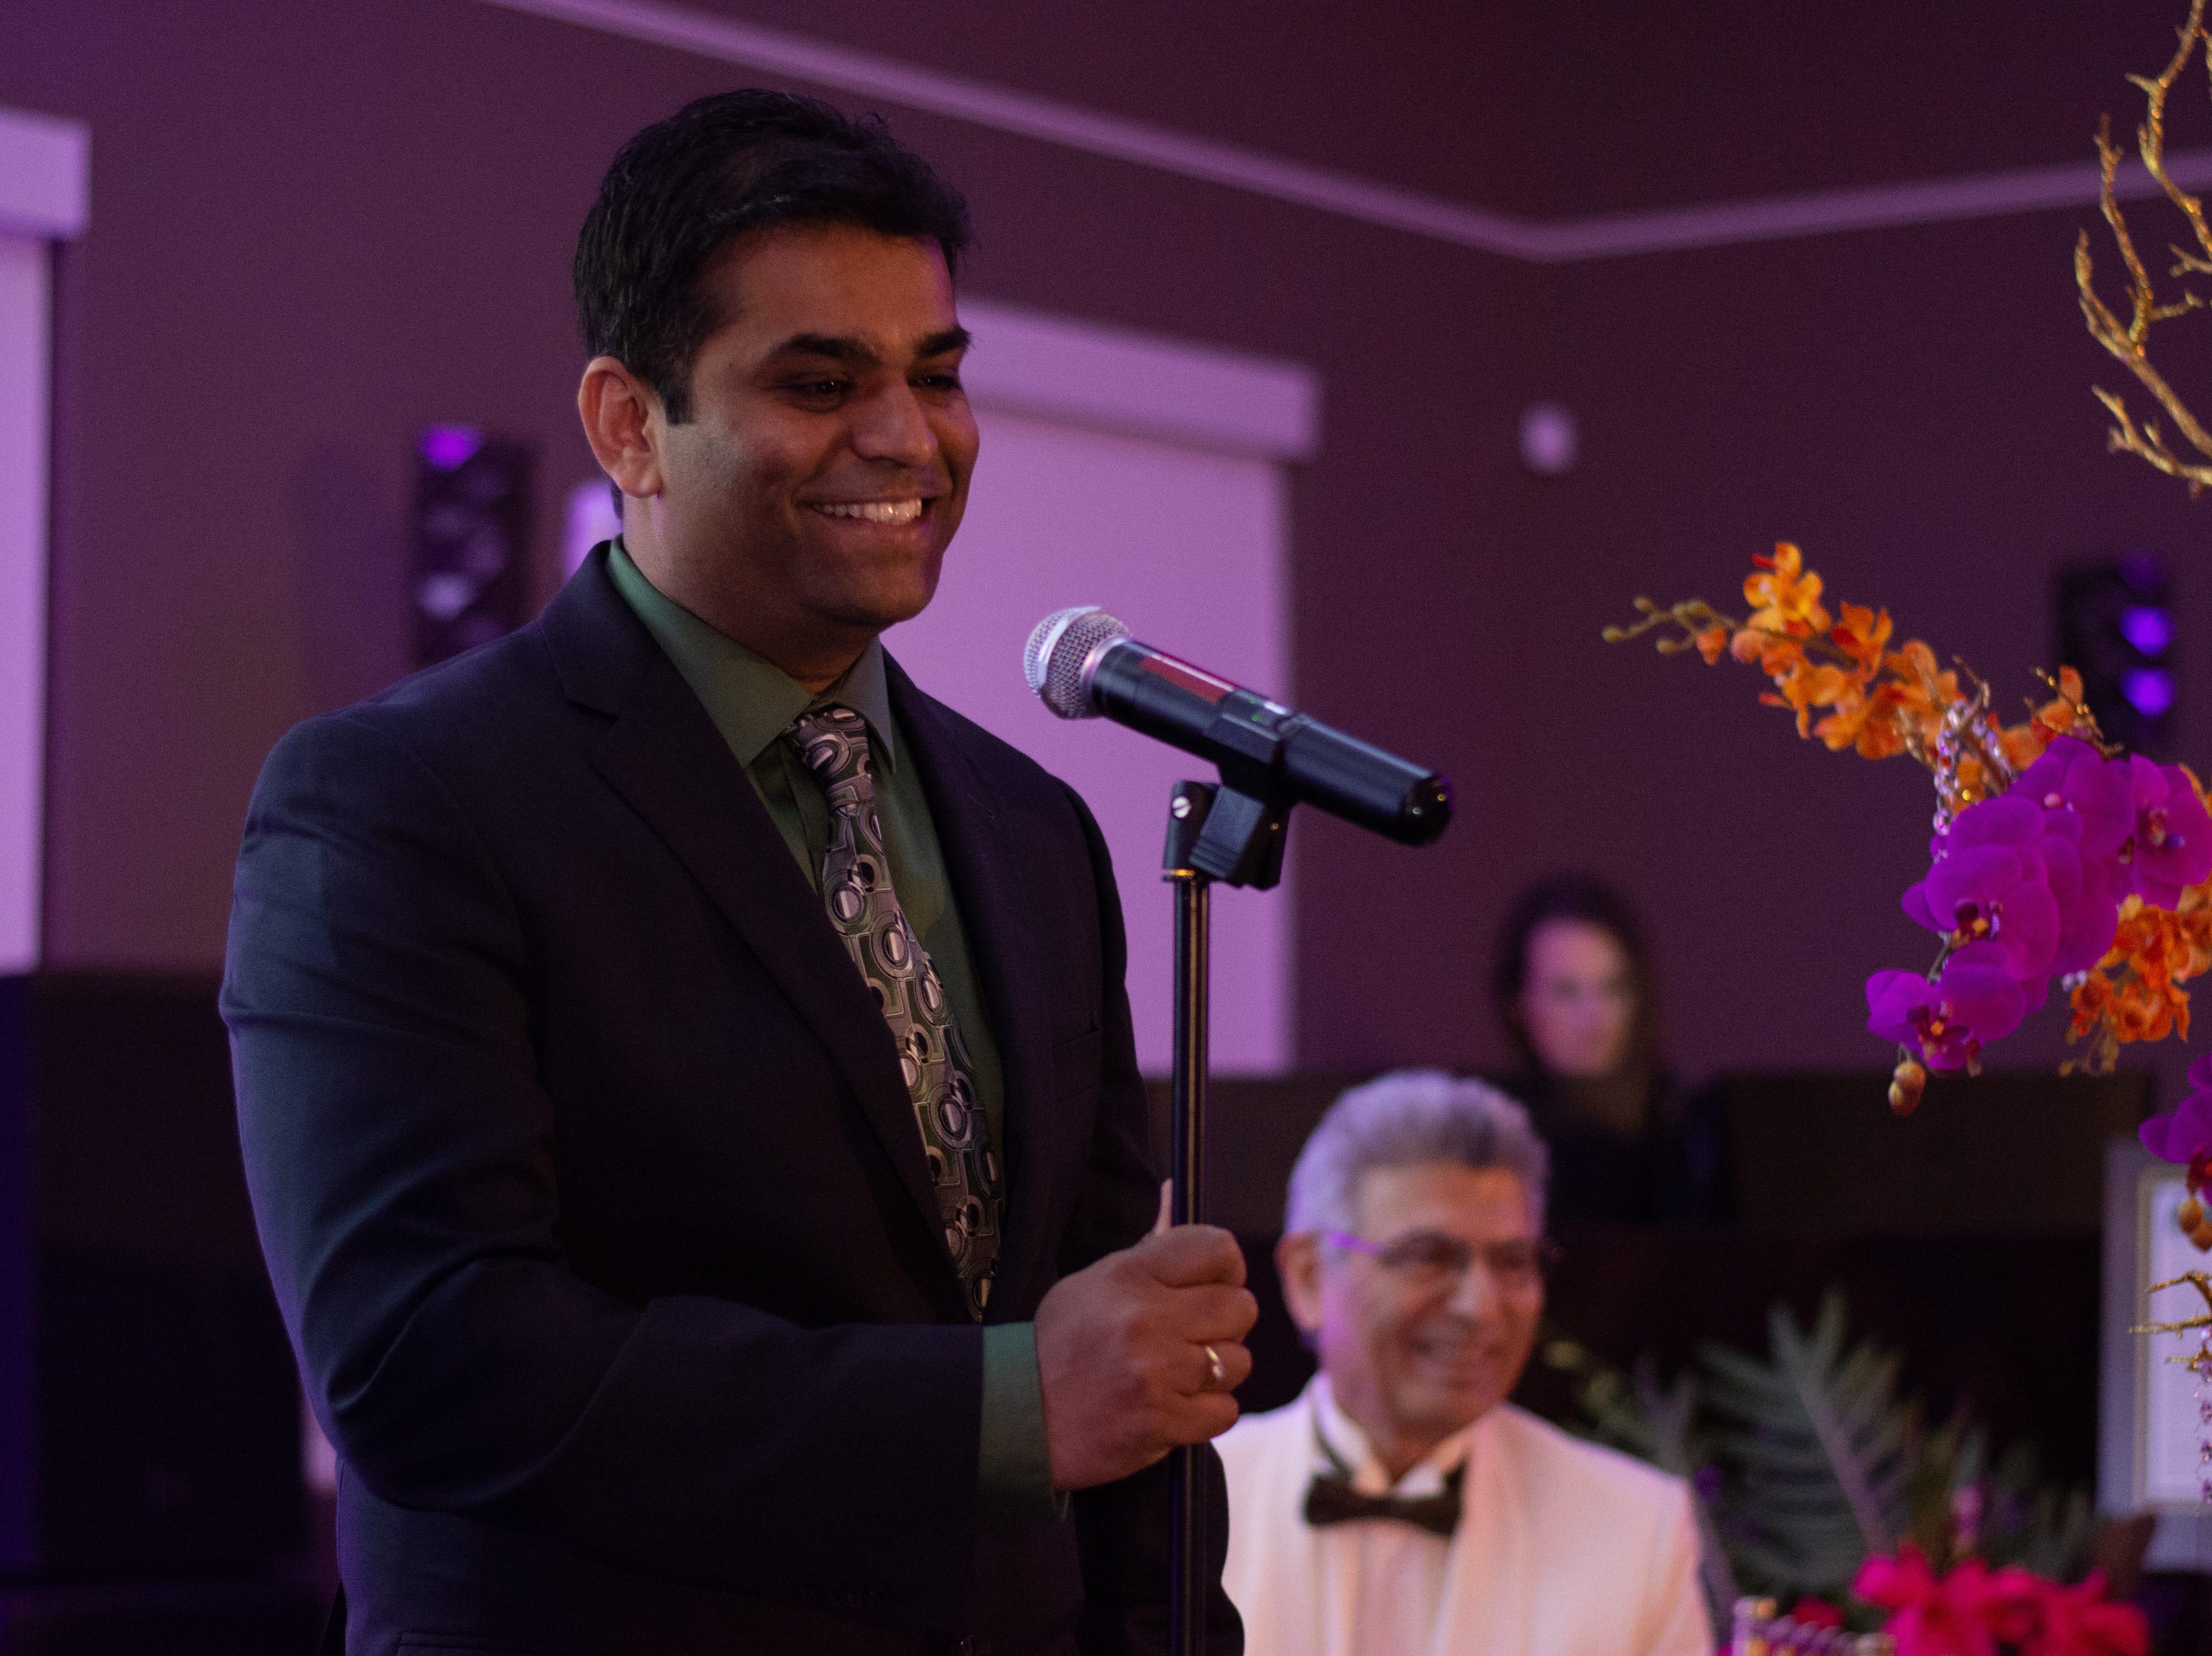 Bimda 2018 president Dr. Pavan Kancharla speaks during the opening ceremony.